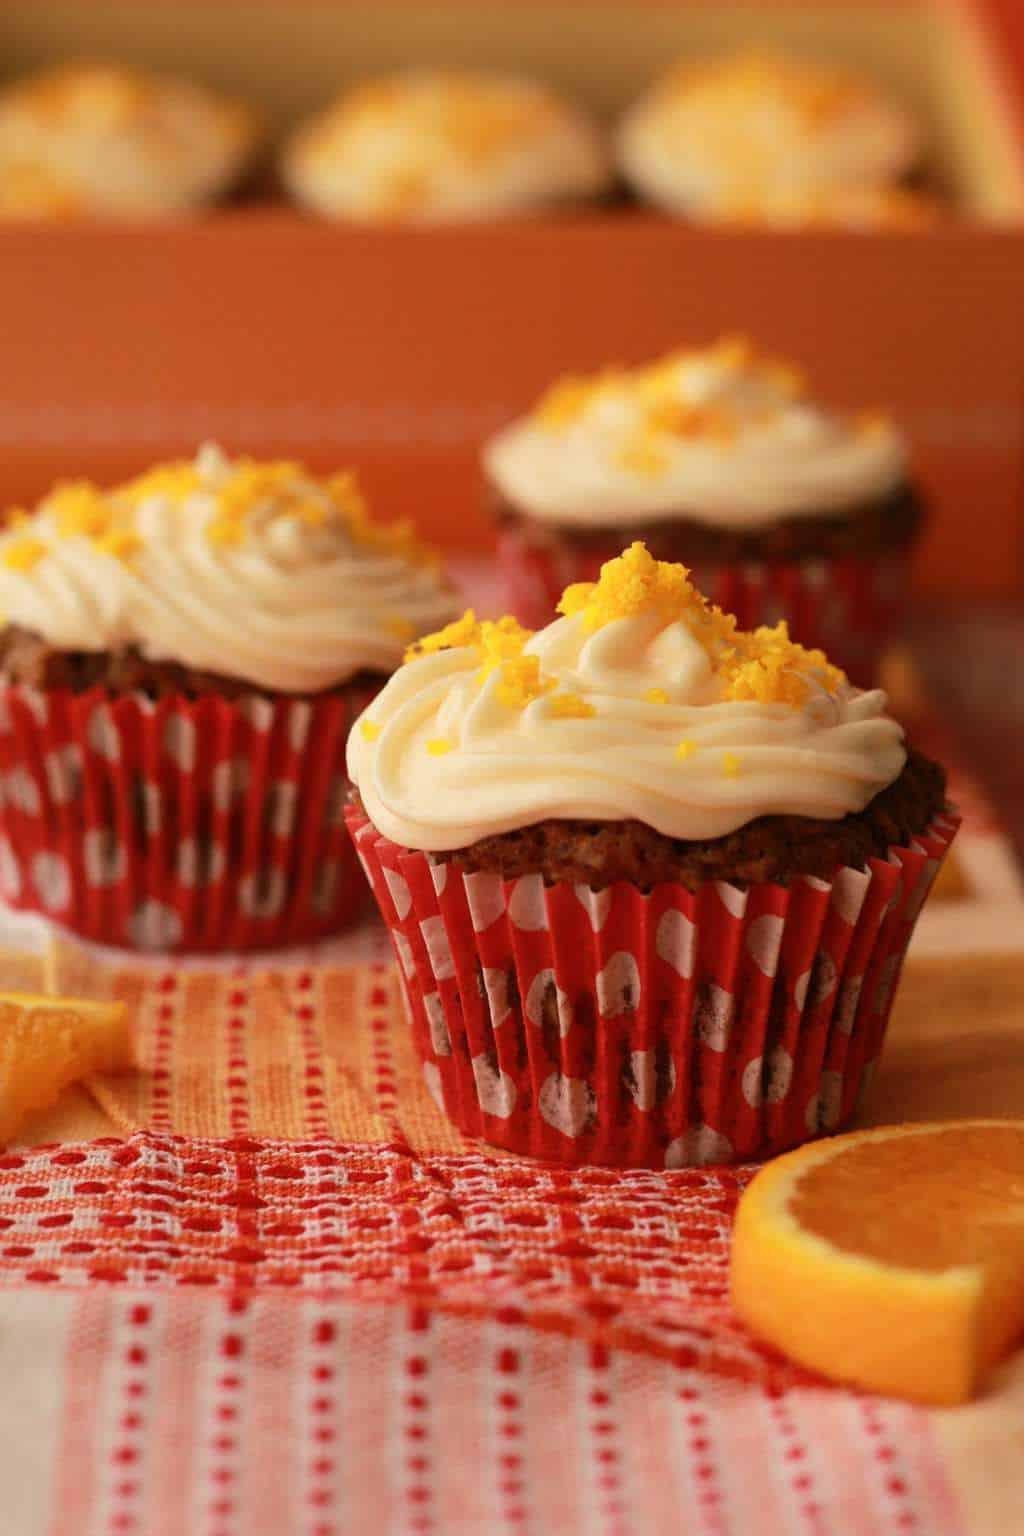 Vegan Carrot Cupcakes  Vegan Carrot Cake Cupcakes Orange and Walnut Loving It